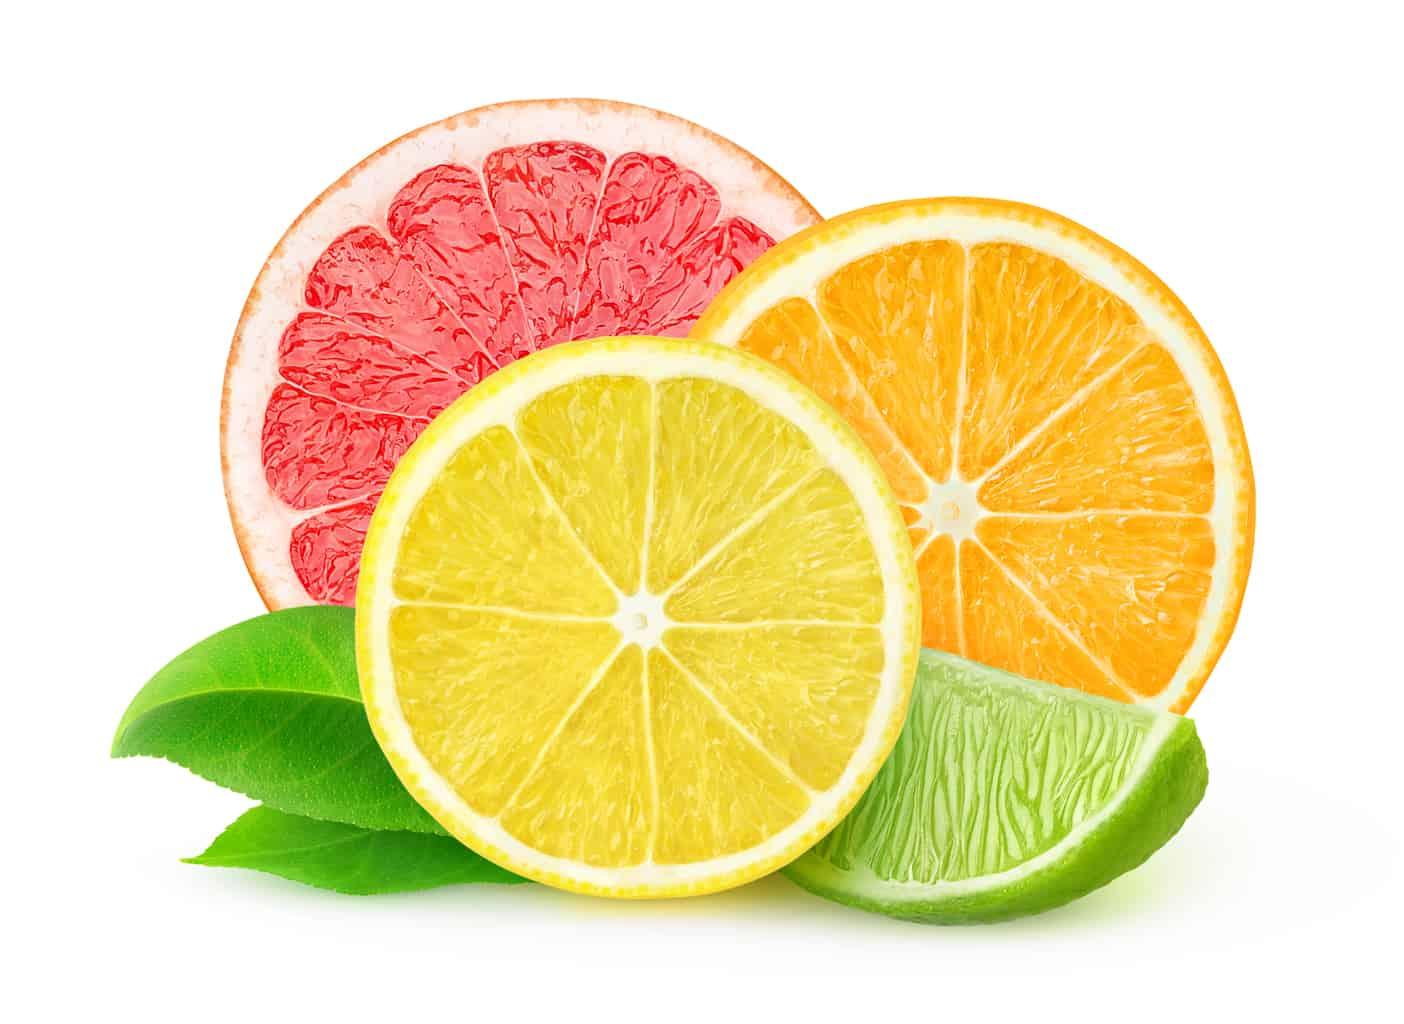 diet detective s calorie bargains spray on fruit diet detectivediet detective lemon clip art free lemon clip art black and white